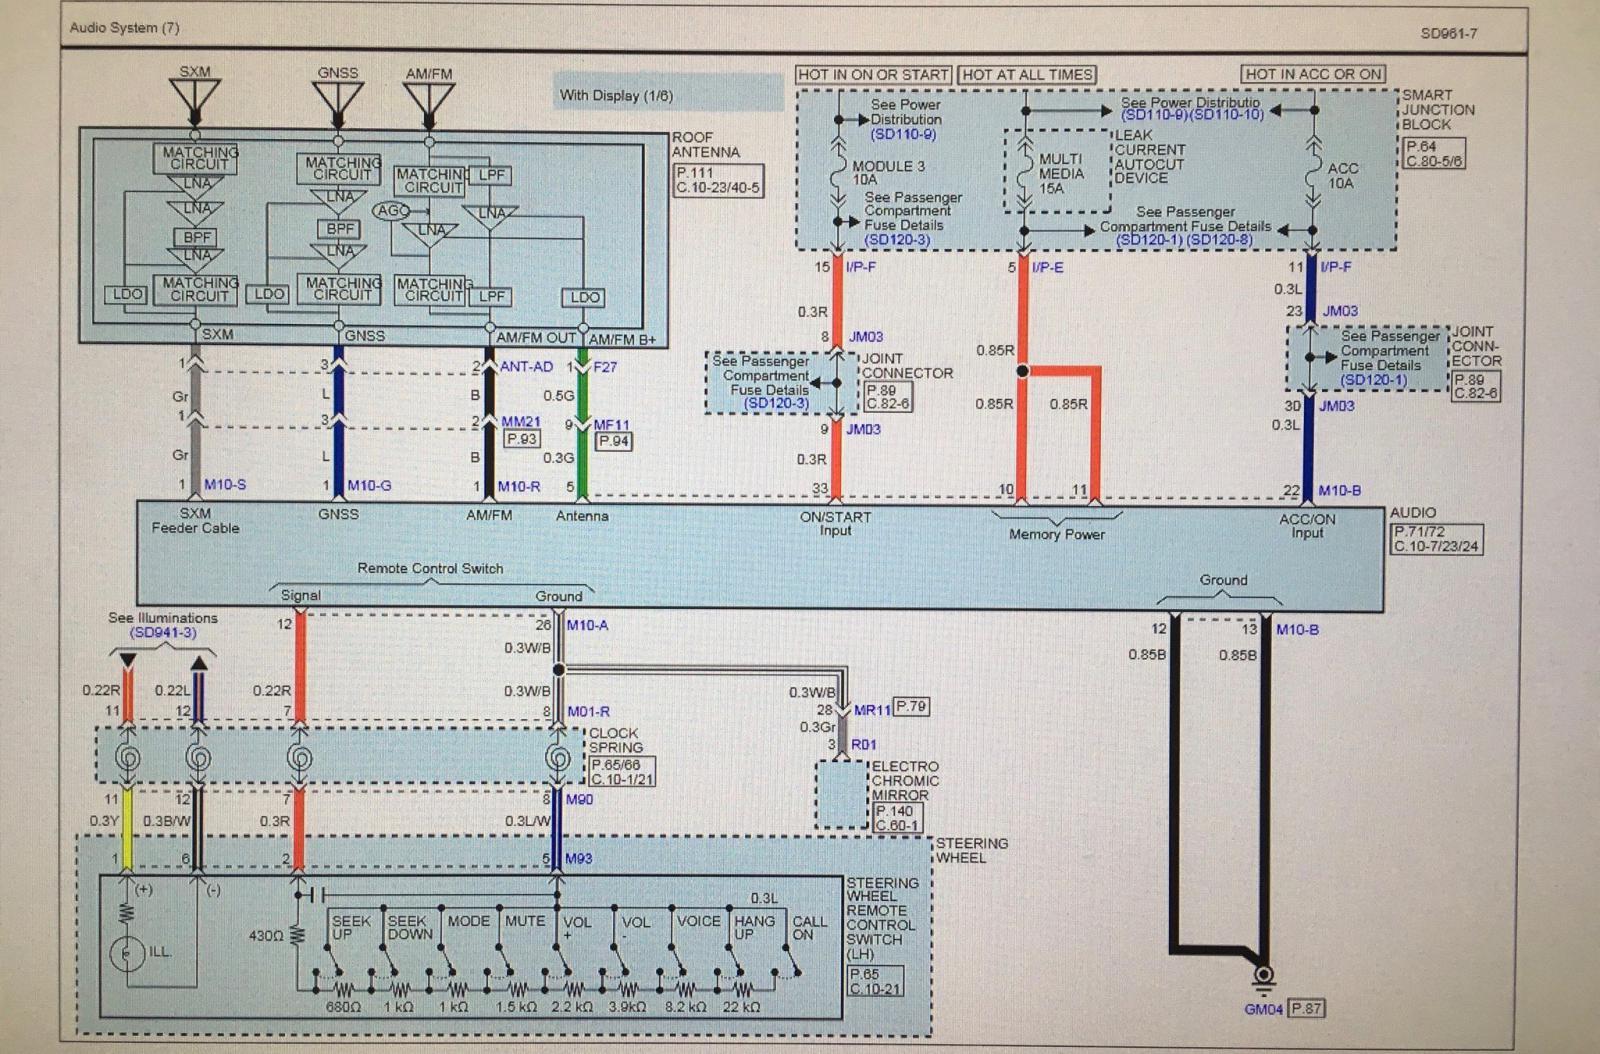 power wheel switch wiring diagram